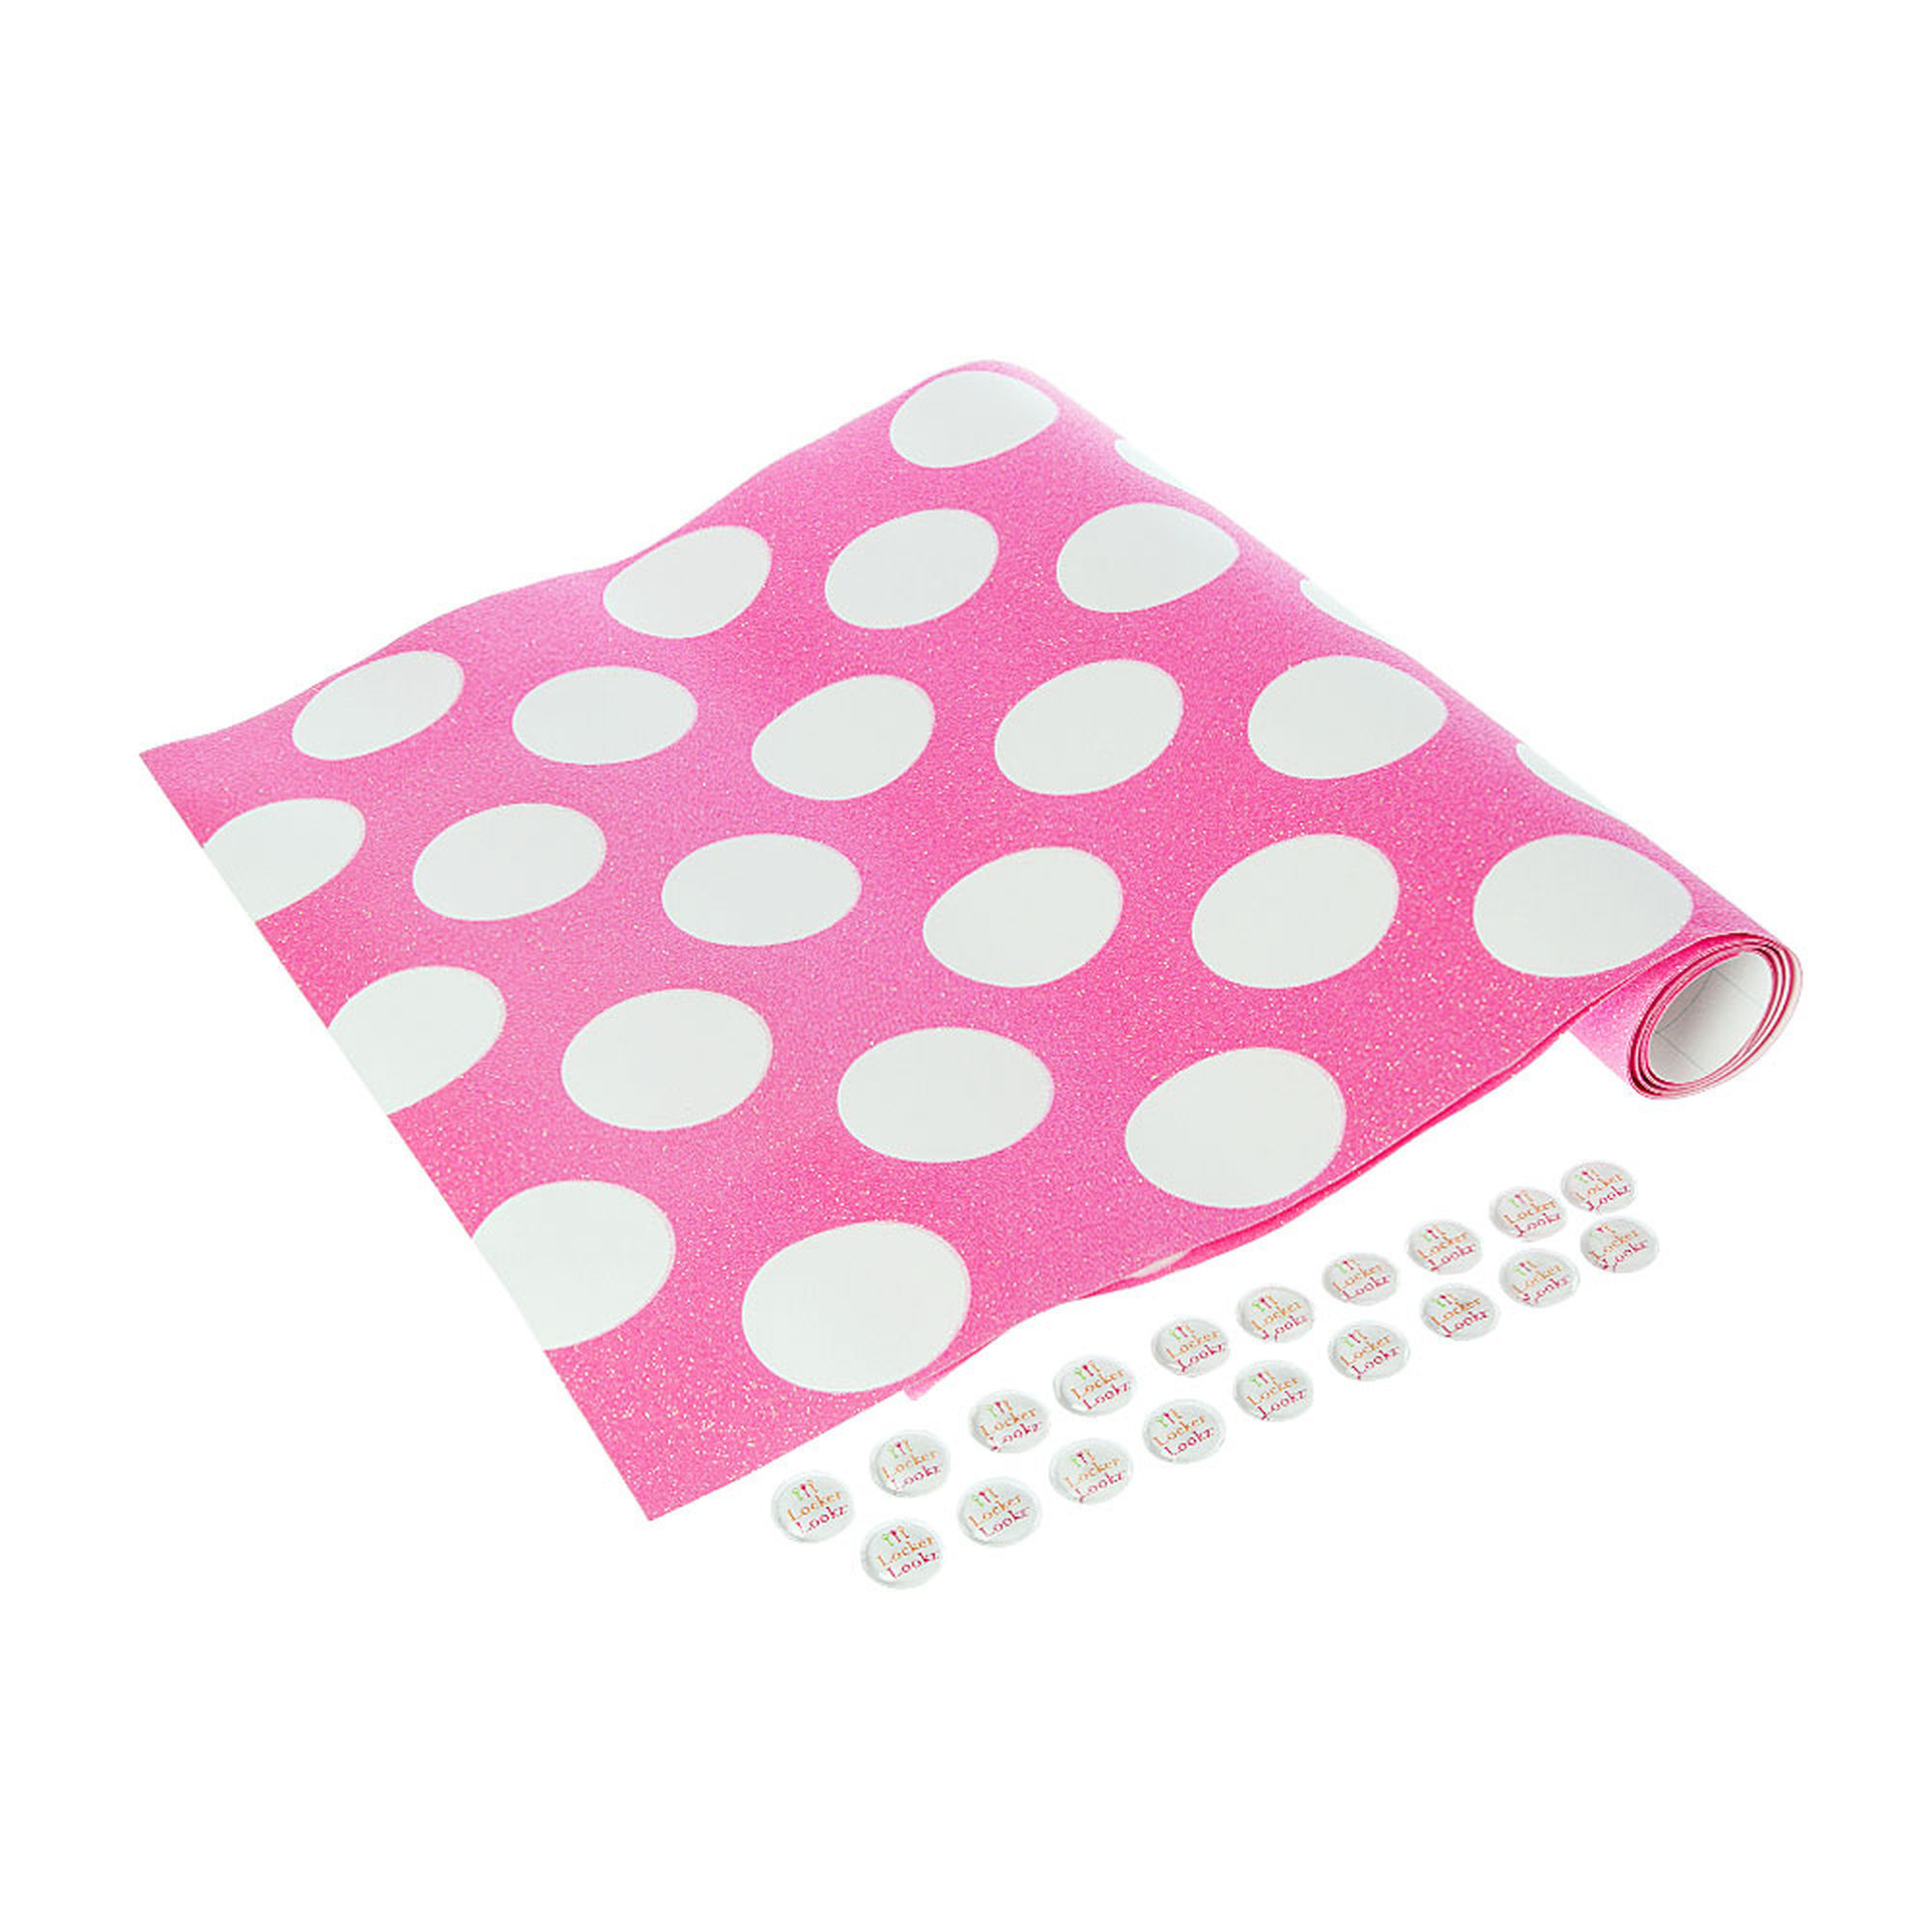 … LockerLookz Pink and White Polka Dots Wallpaper, …